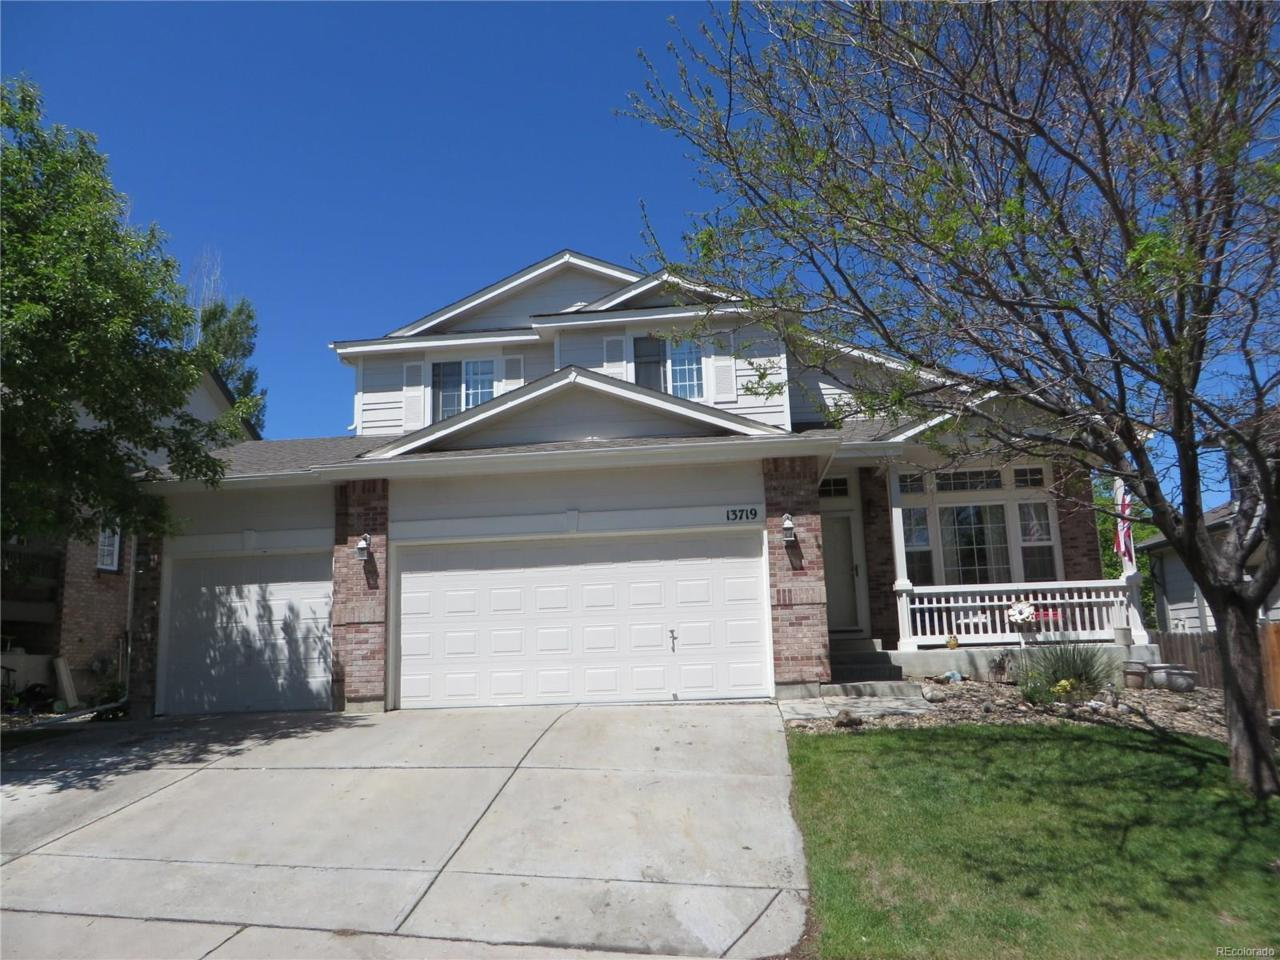 13719 Adams Street, Thornton, CO 80602 (MLS #5545366) :: 8z Real Estate